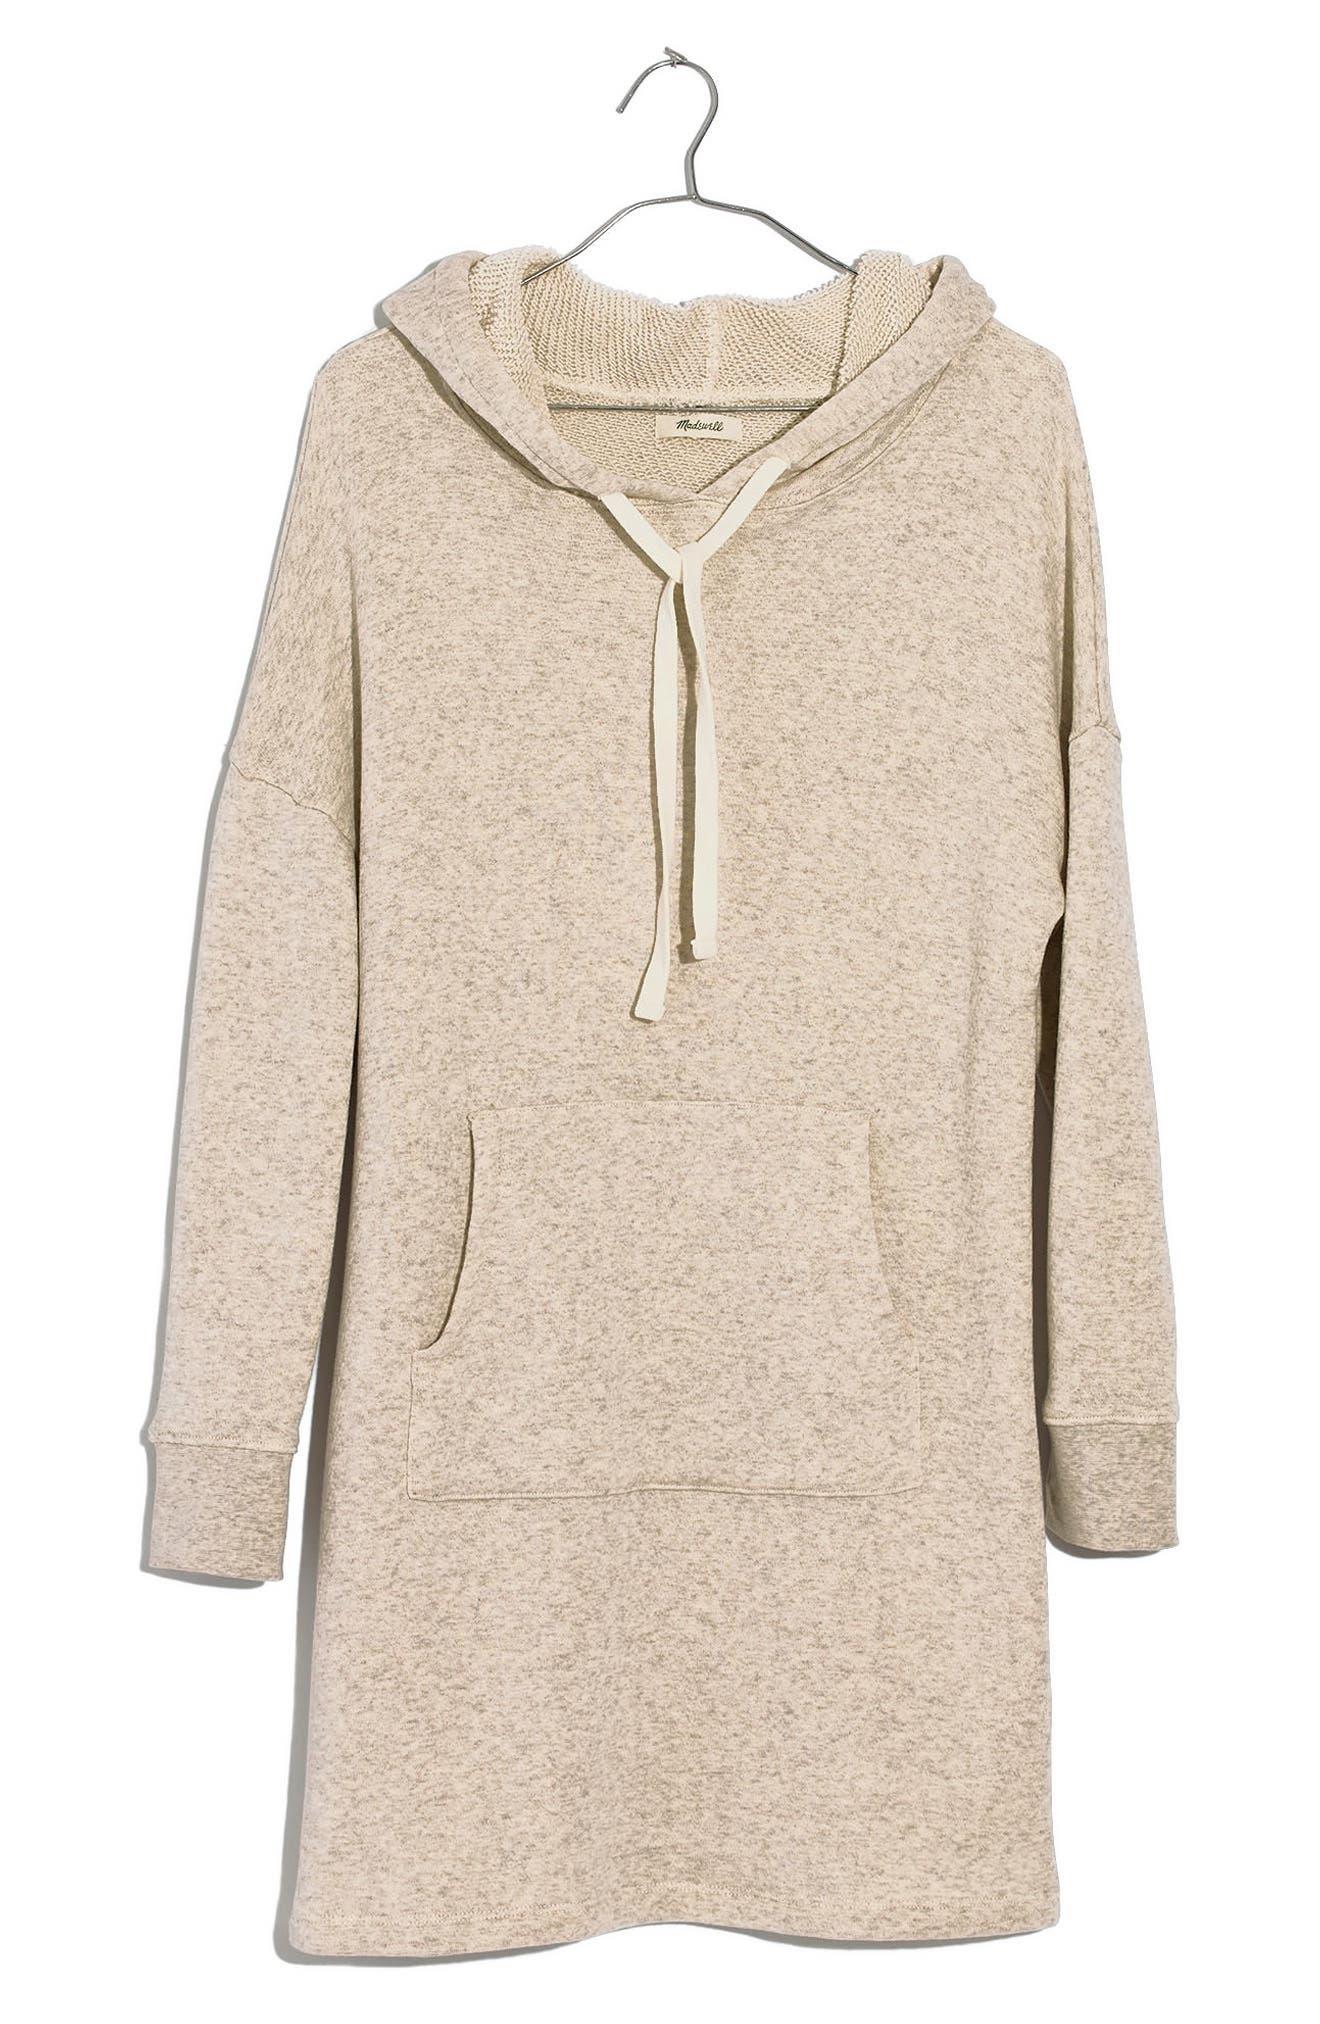 Hooded Sweatshirt Dress,                             Alternate thumbnail 4, color,                             020